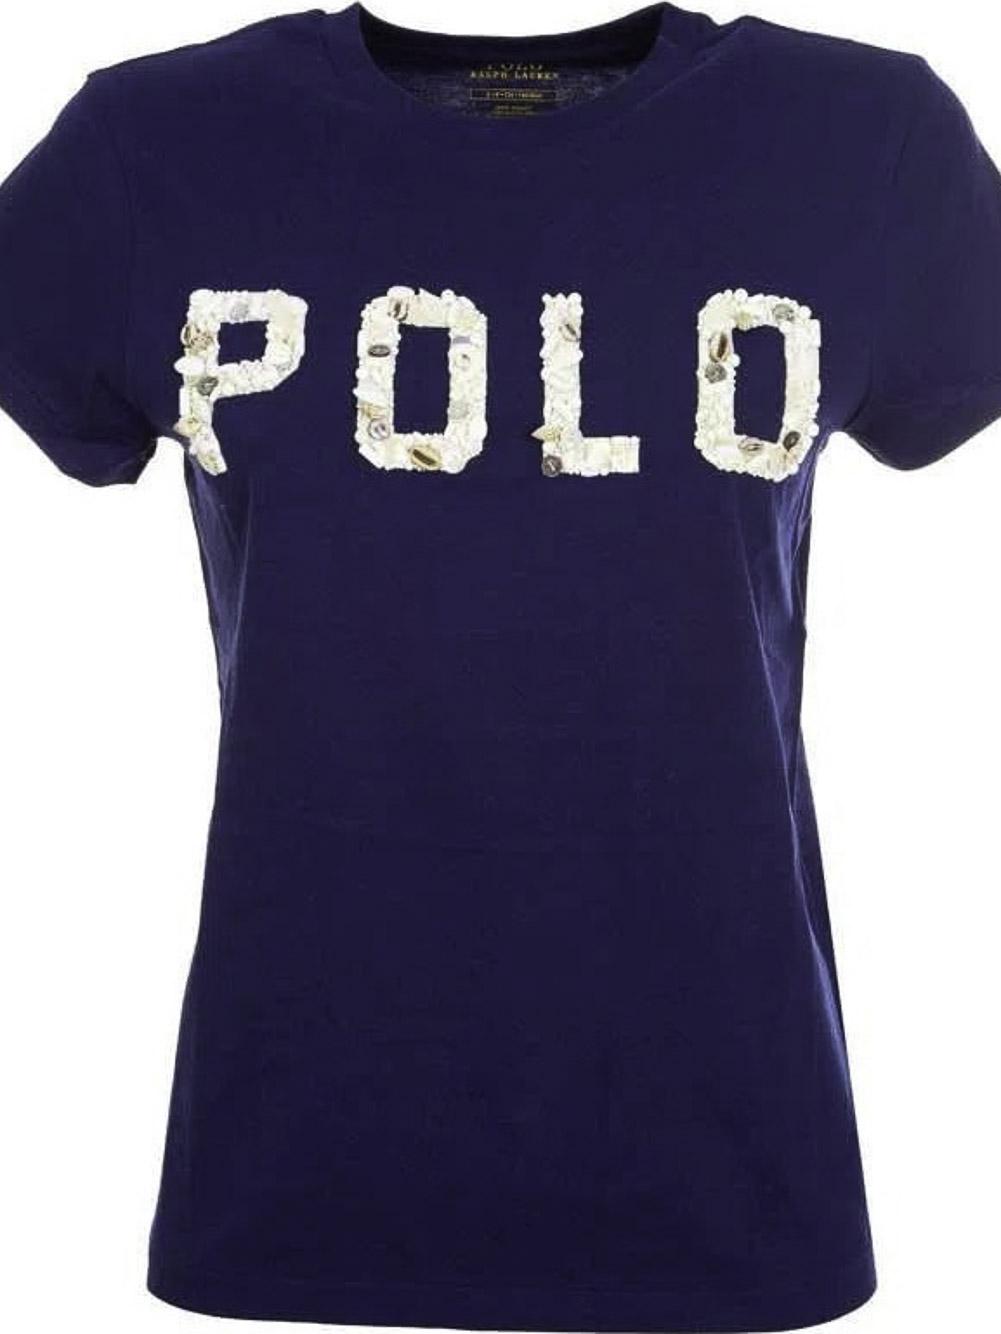 POLO RALPH LAUREN Μπλούζα T-Shirt 211827661002 ΜΠΛΕ